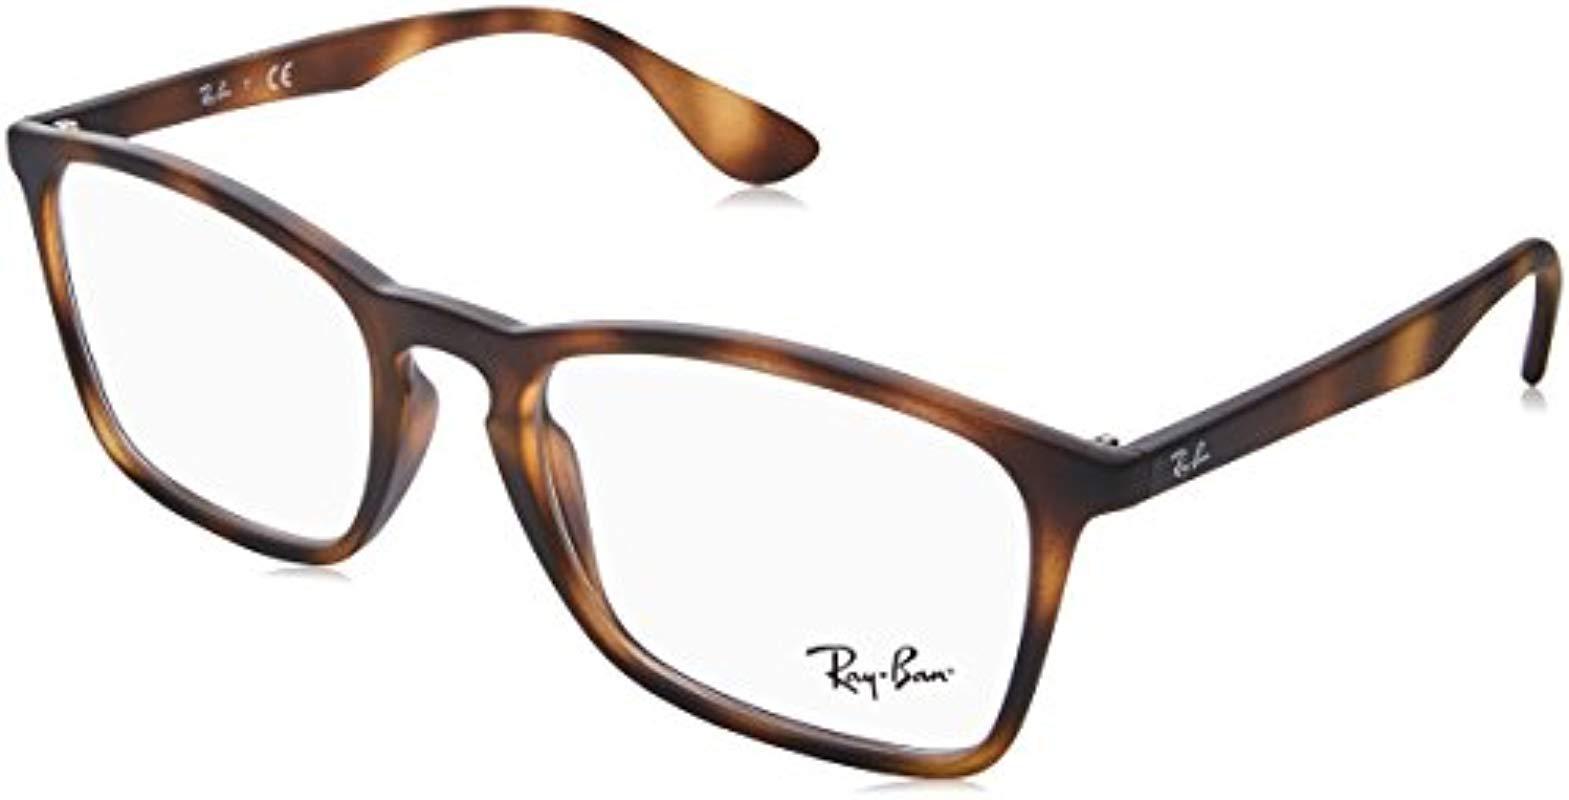 62551585d0 Ray-Ban 0rx 7045 5365 55 Optical Frames